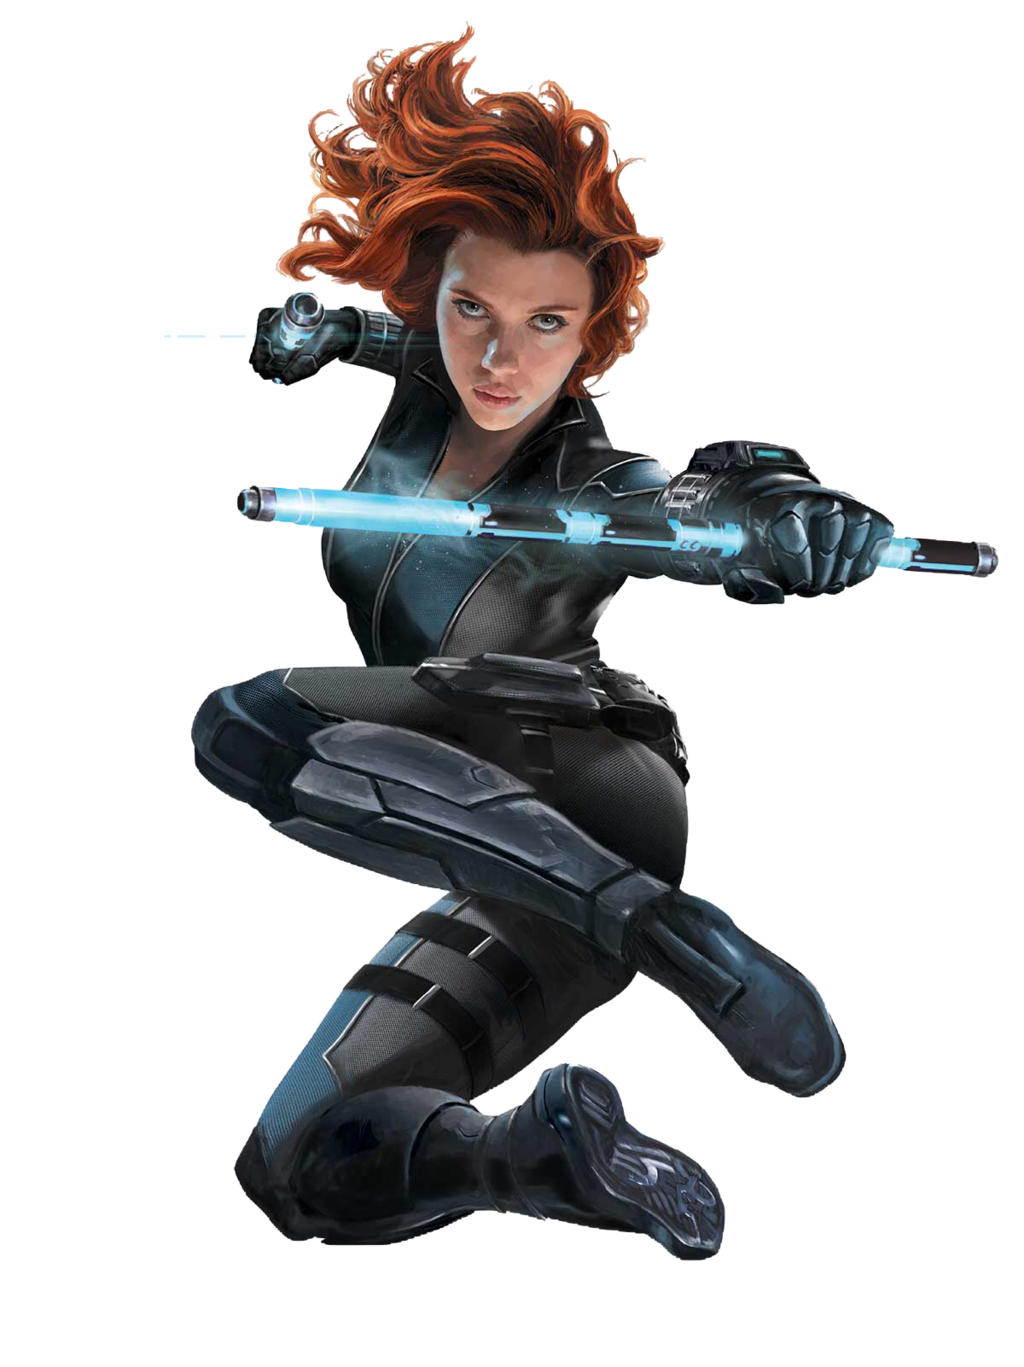 . PlusPng.com Captain America Civil War: Black Widow PNG 4 by sidewinder16 - Black Widow PNG